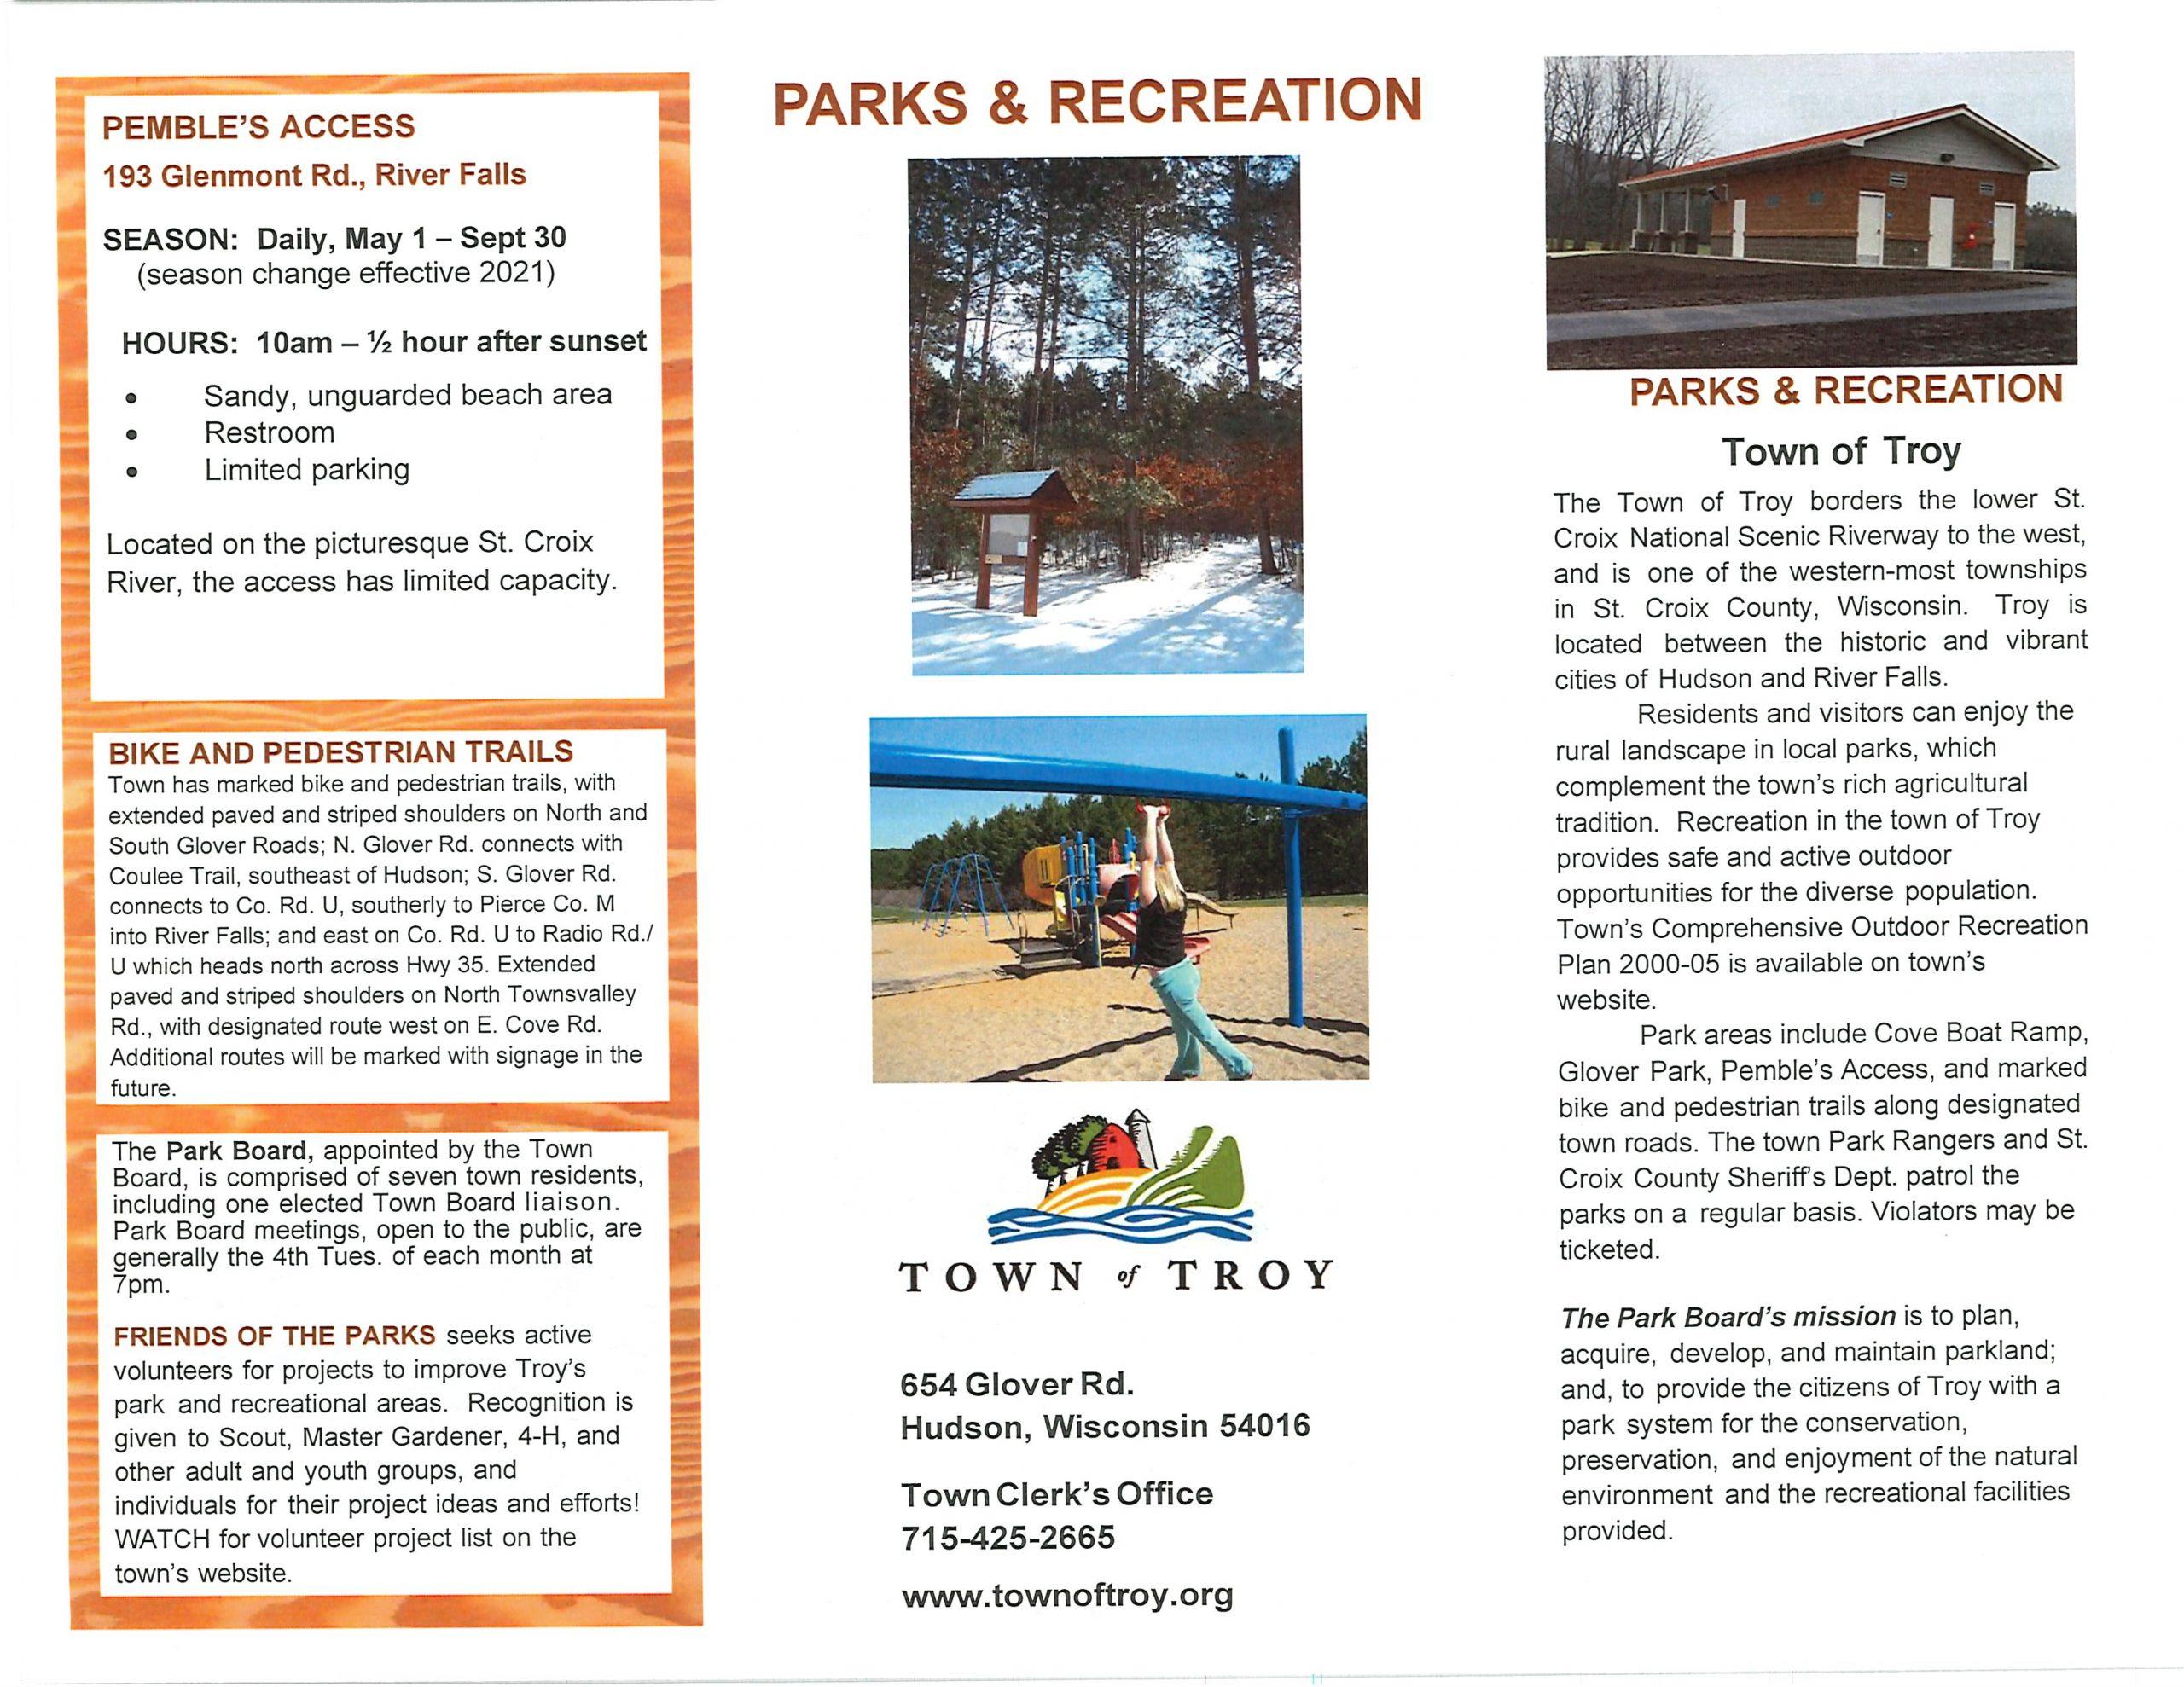 park brochure front page 03 2021